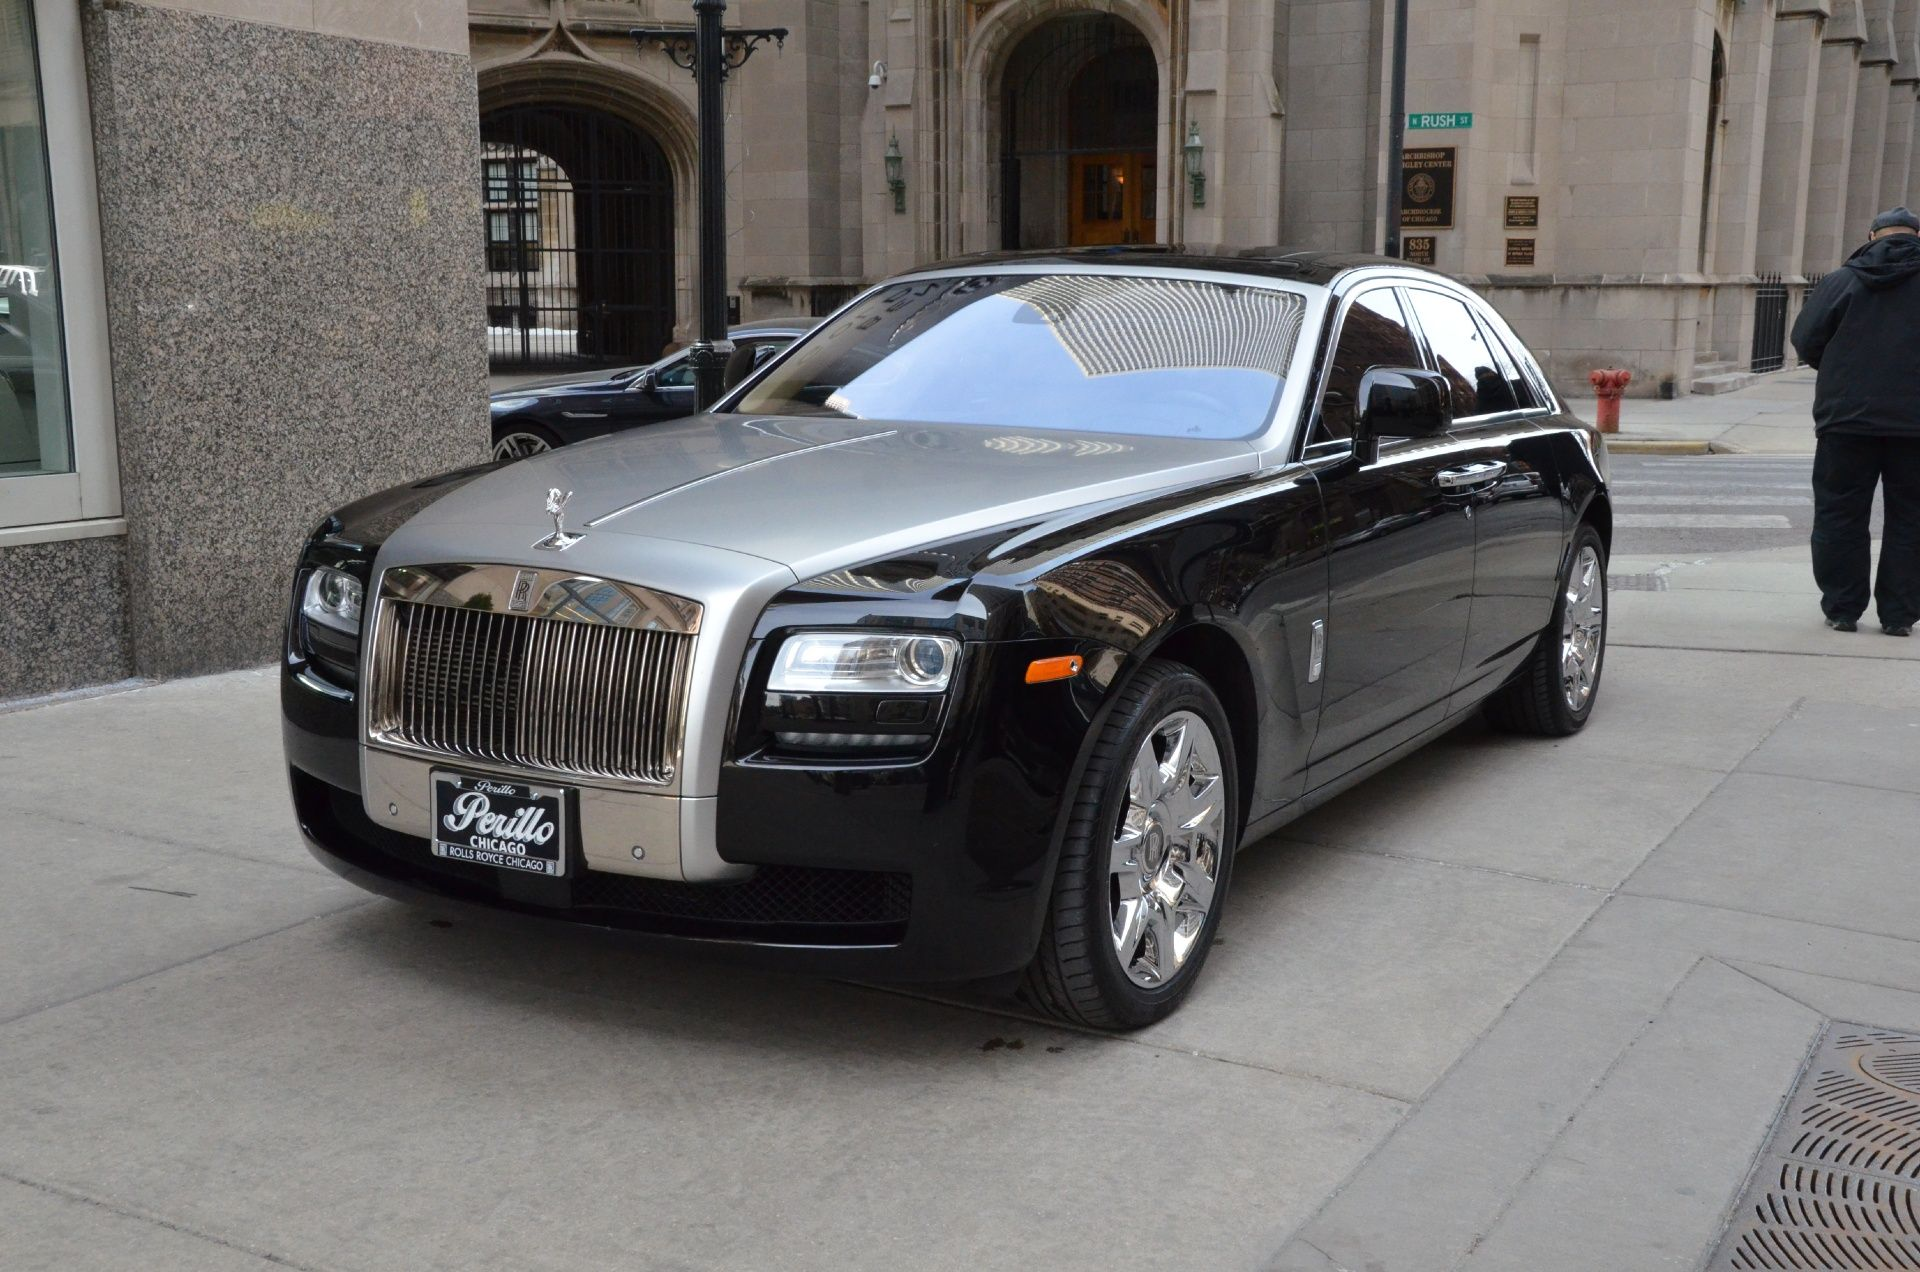 2011 Rolls Royce Ghost CARS Pinterest